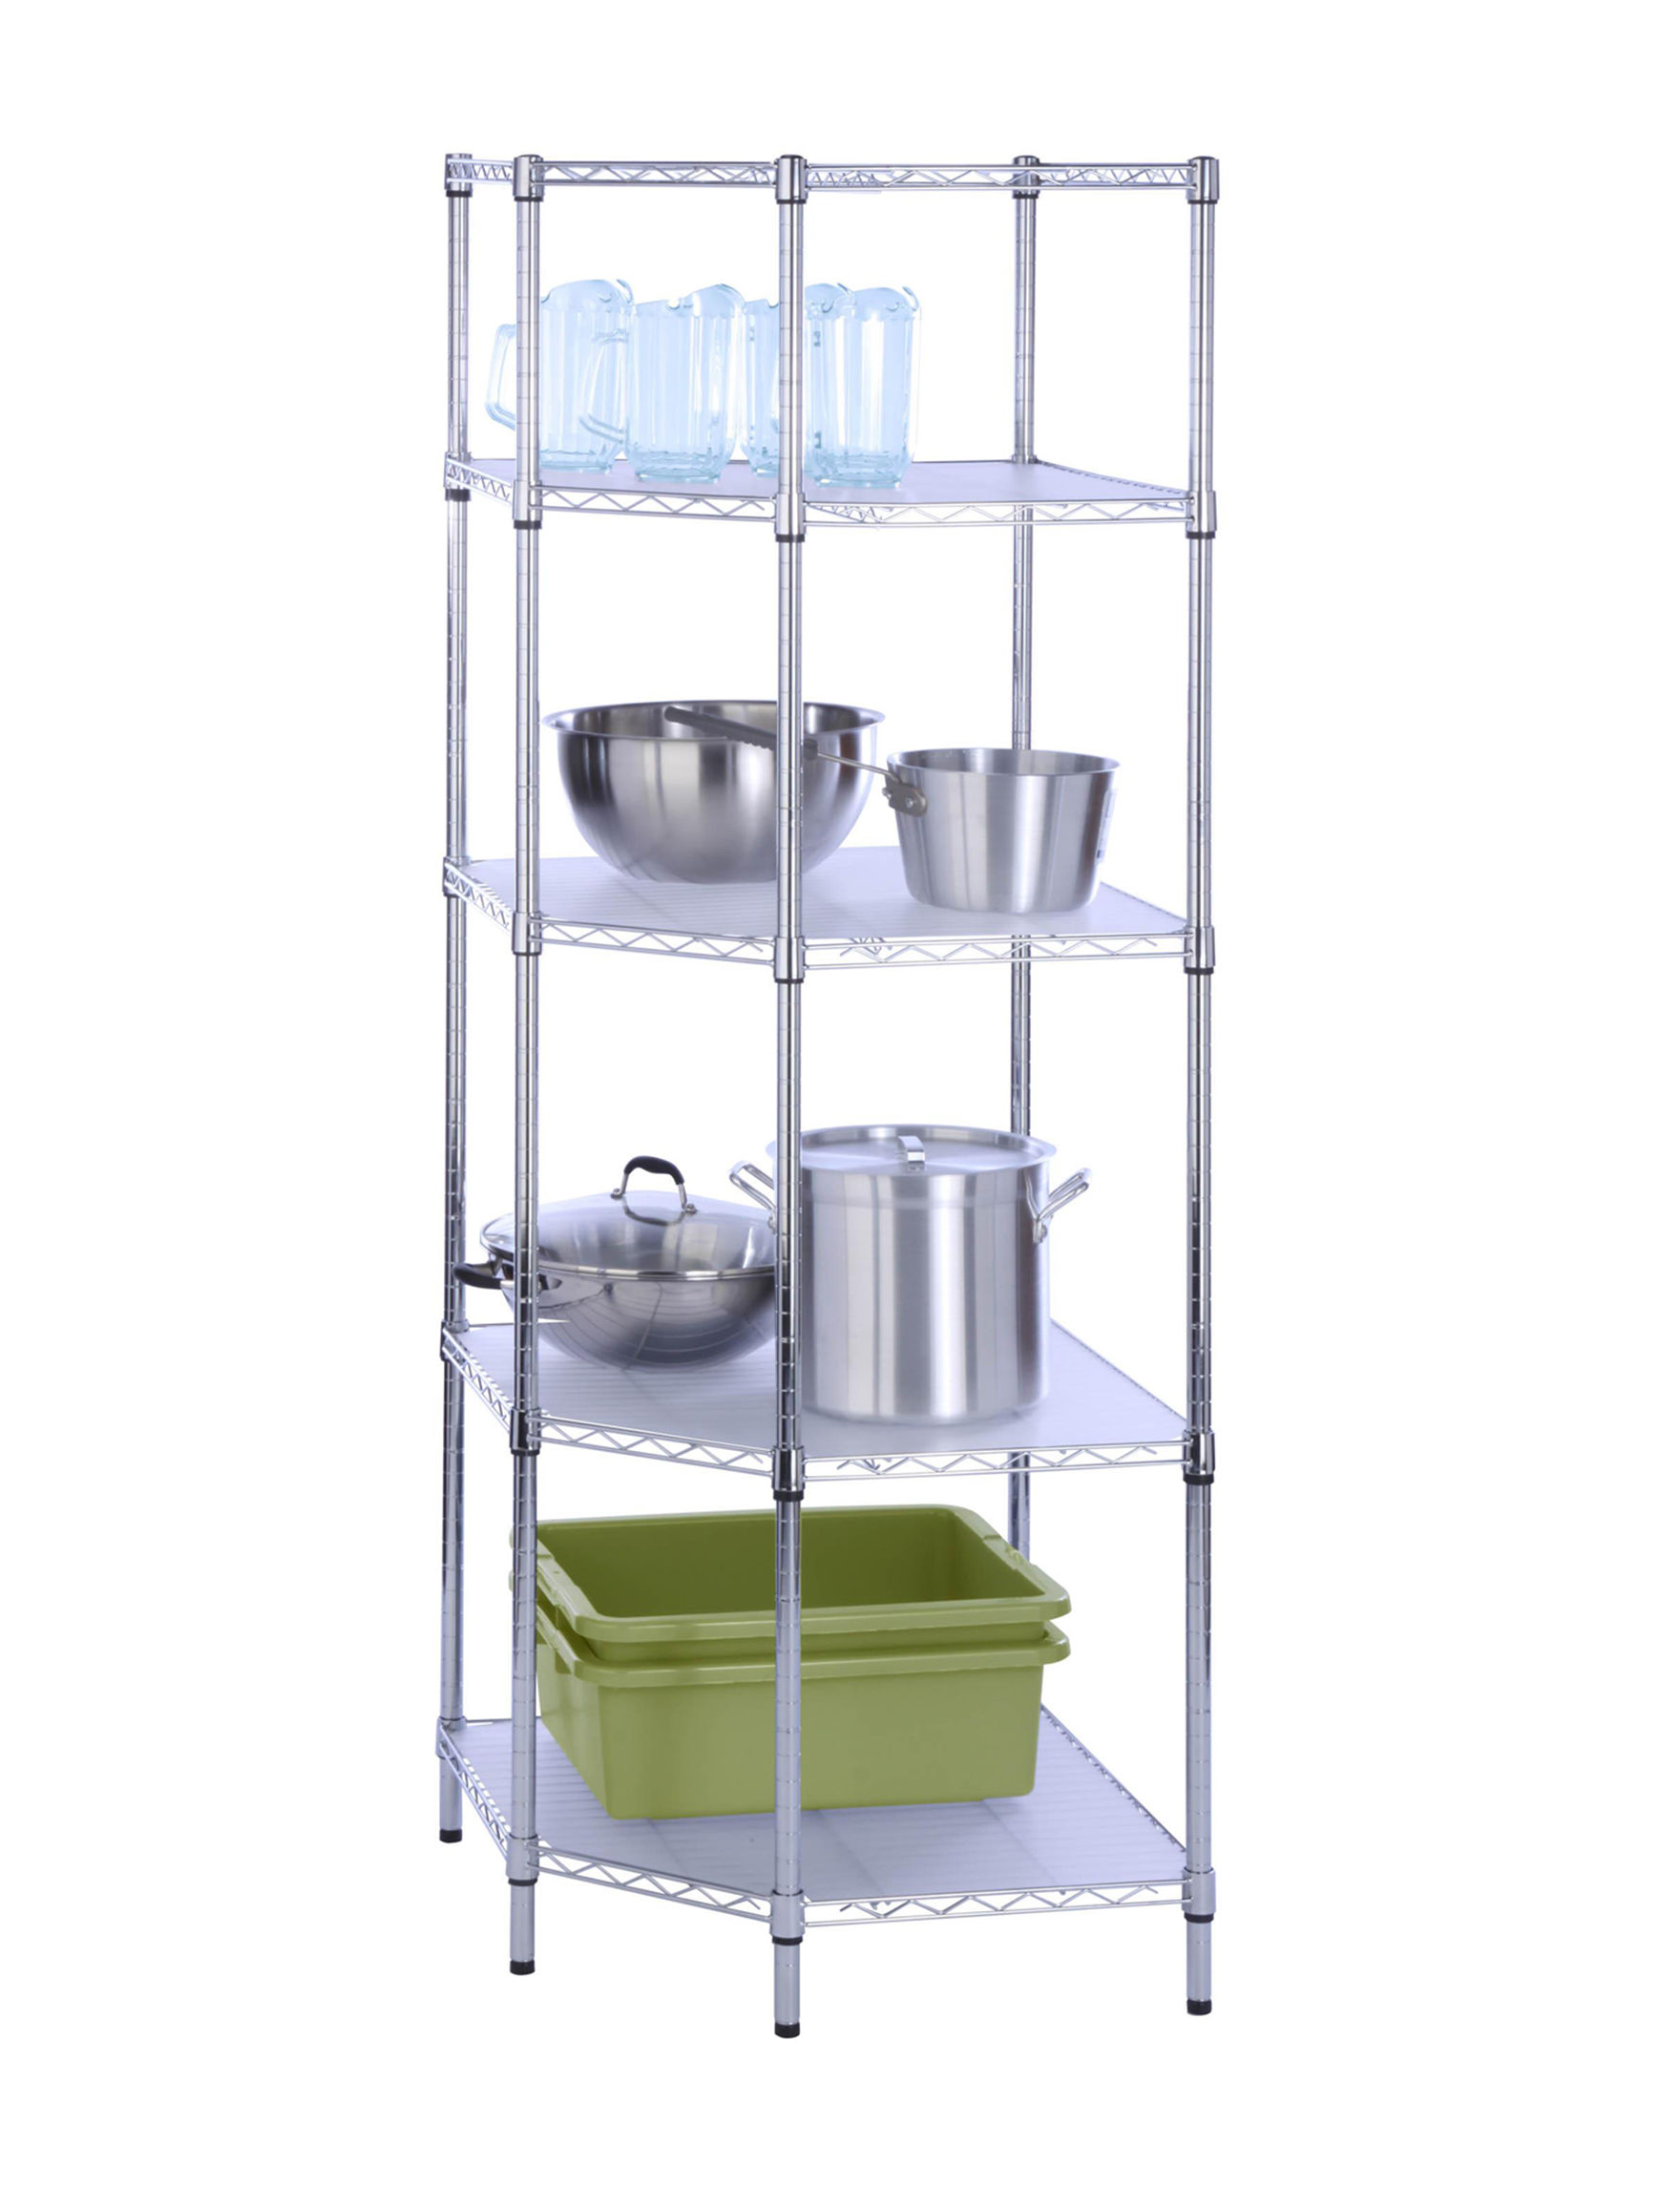 Honey-Can-Do International Chrome Storage Shelves Storage & Organization